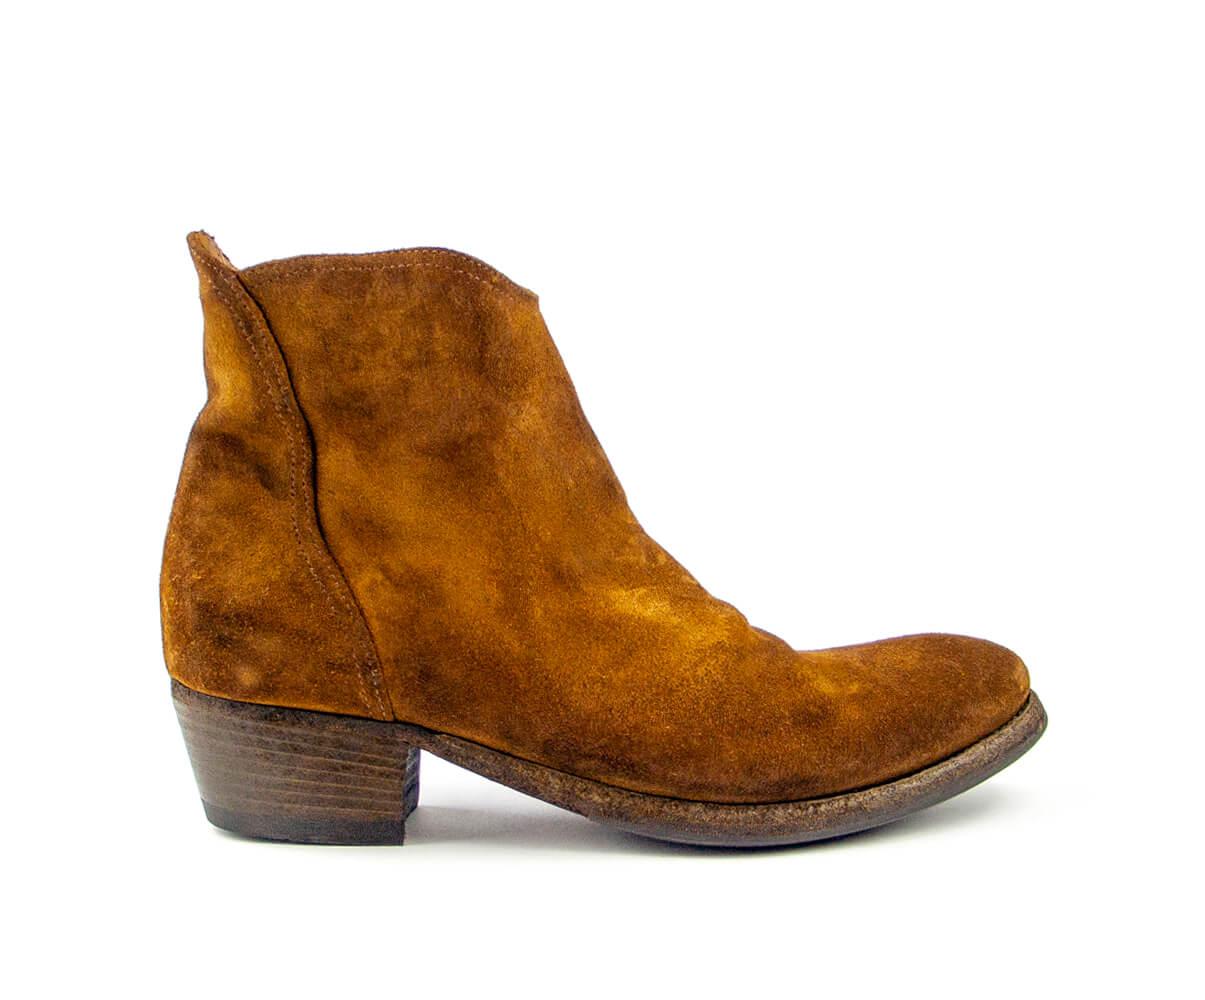 011 ecla scarpe rgb